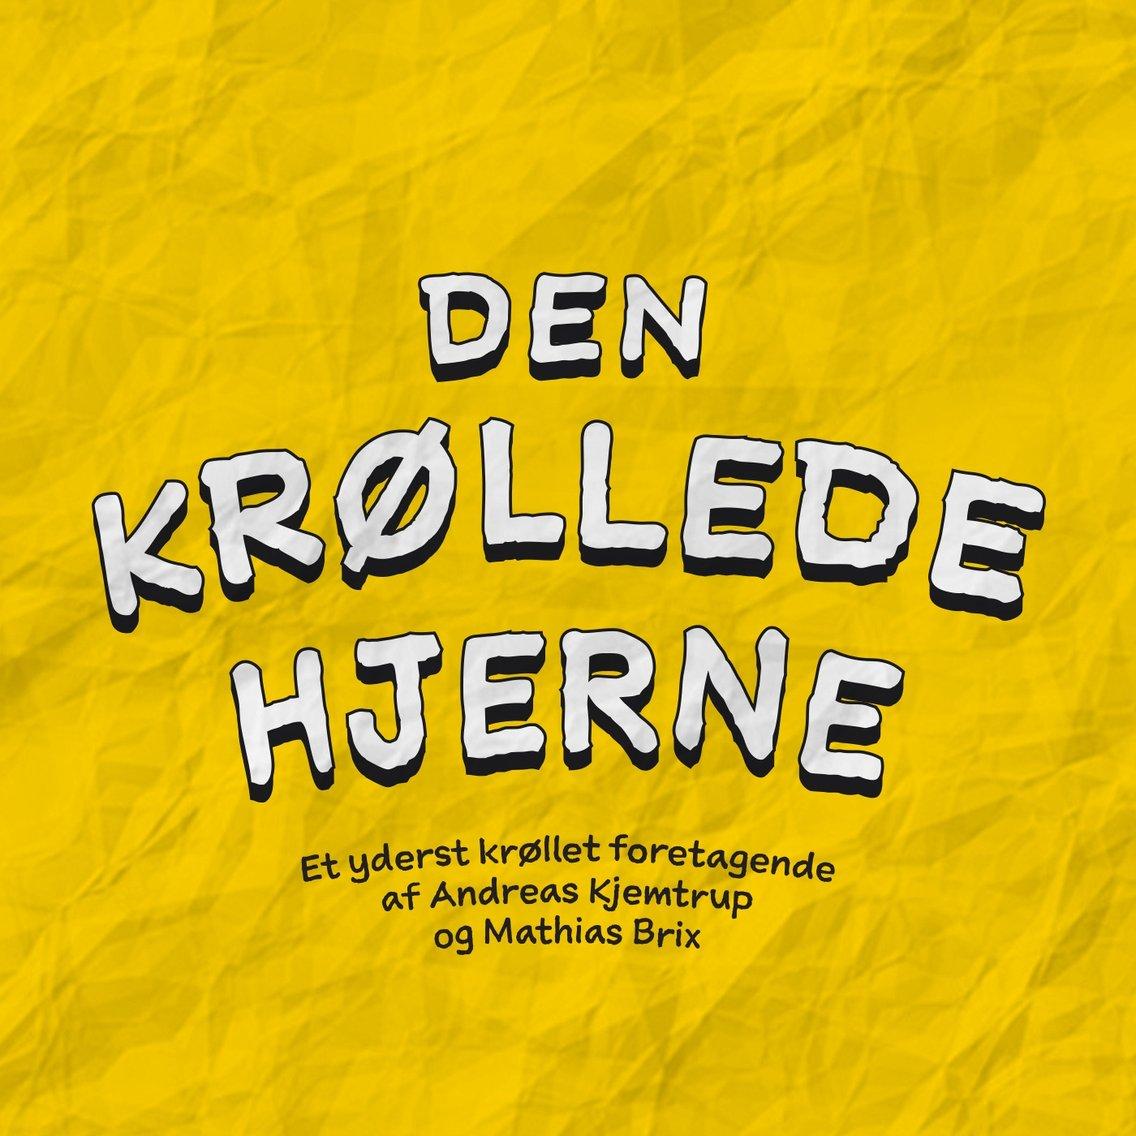 Den Krøllede Hjerne - imagen de portada